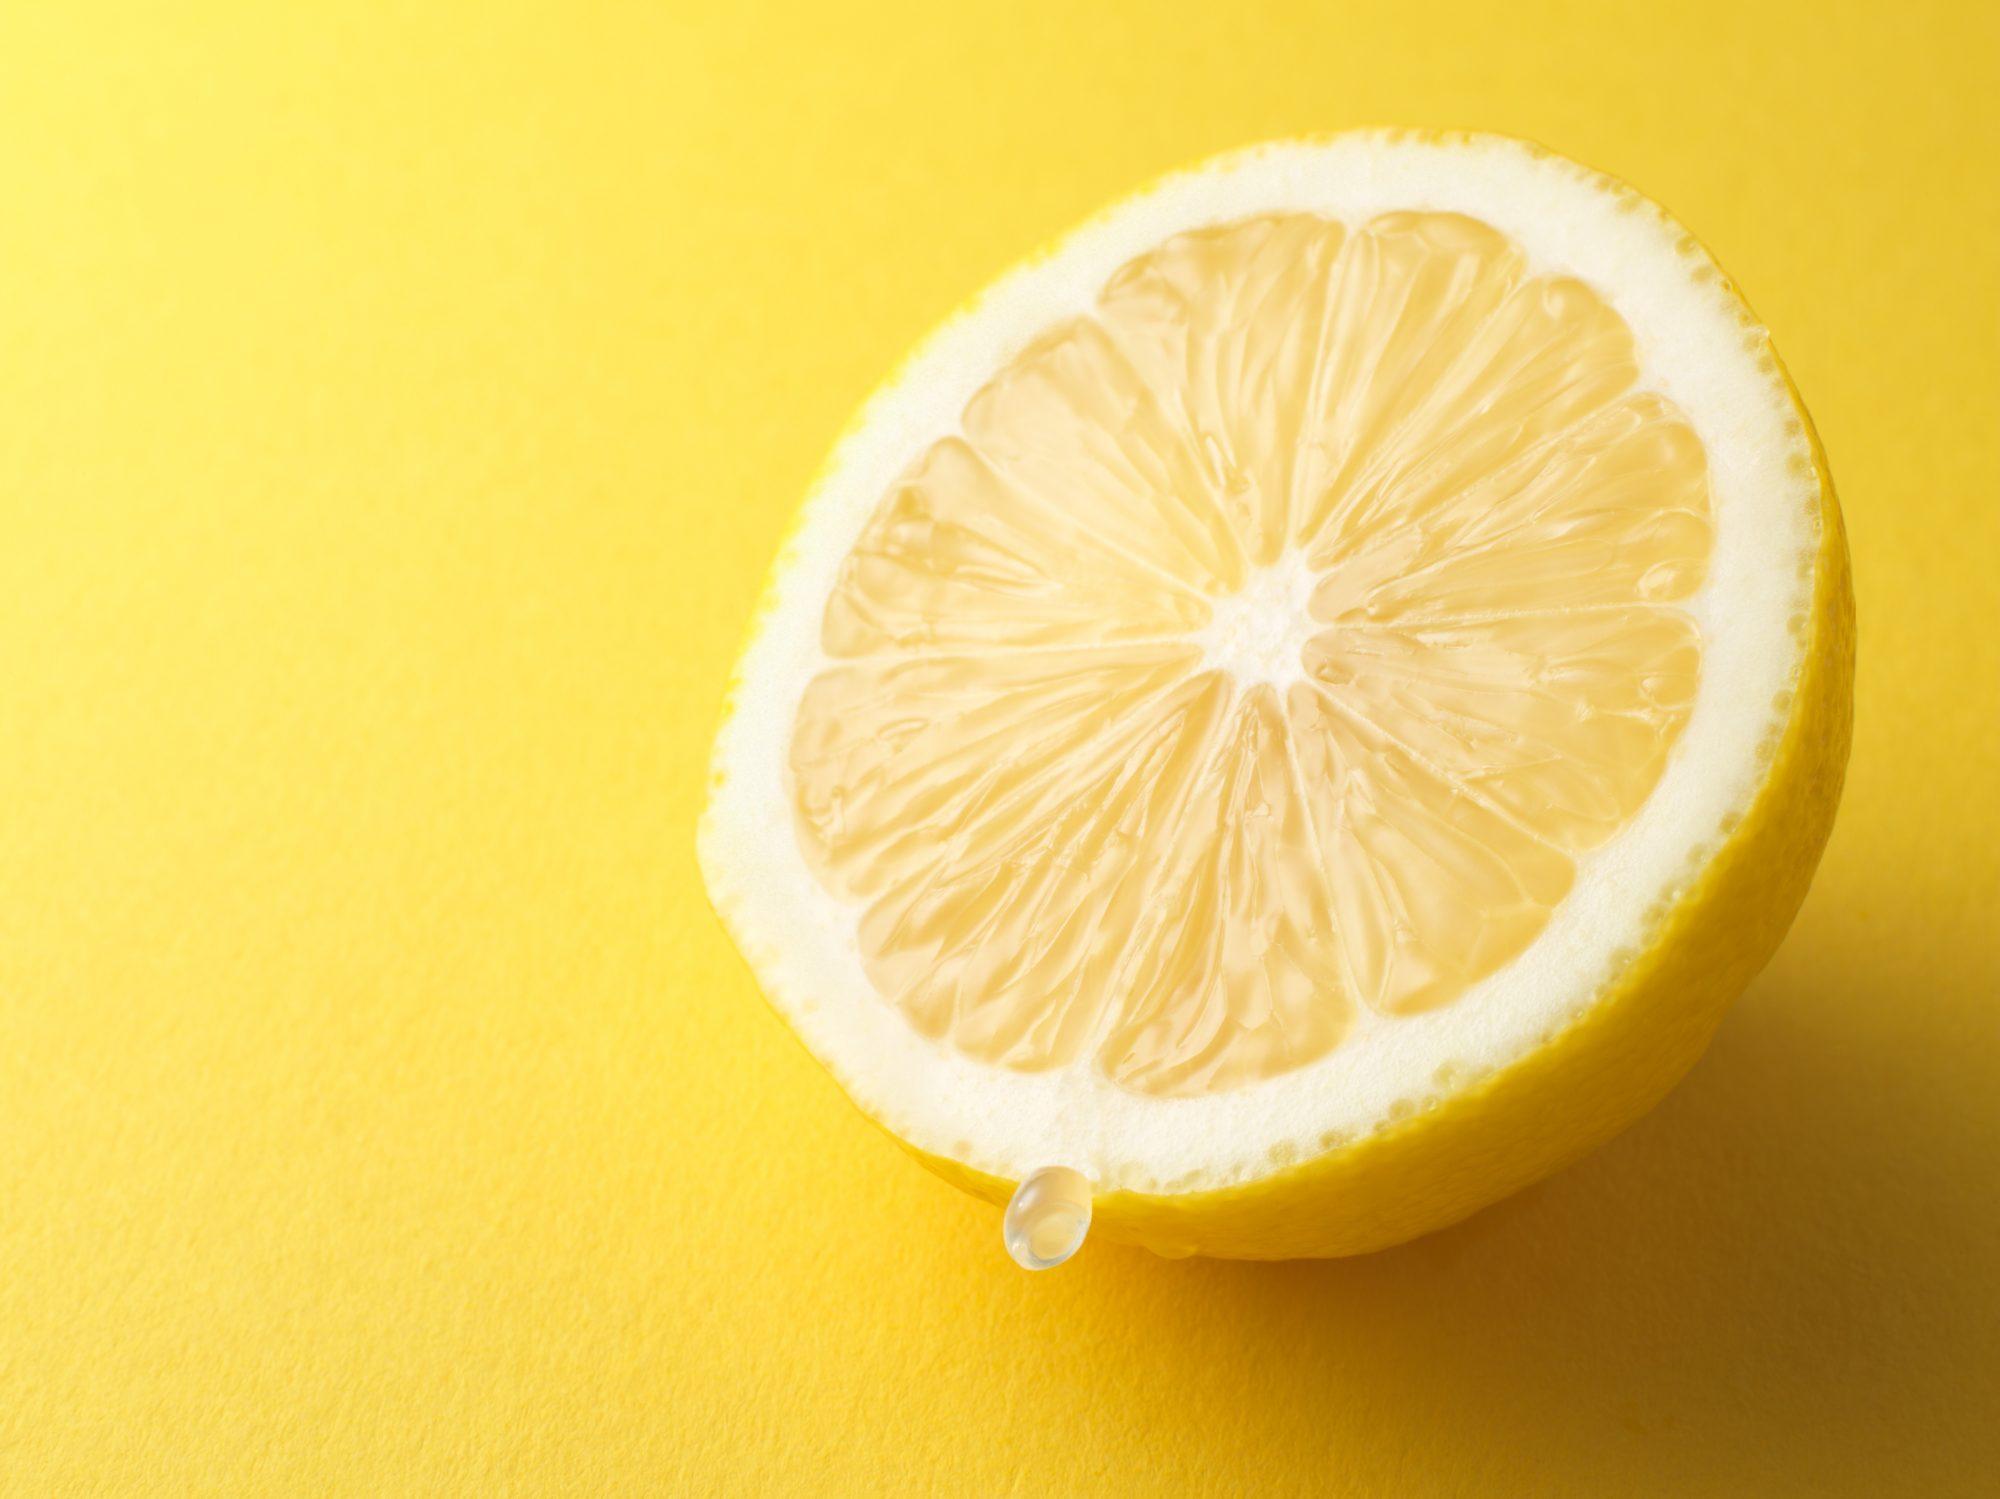 Cut Lemon Getty 4/22/20